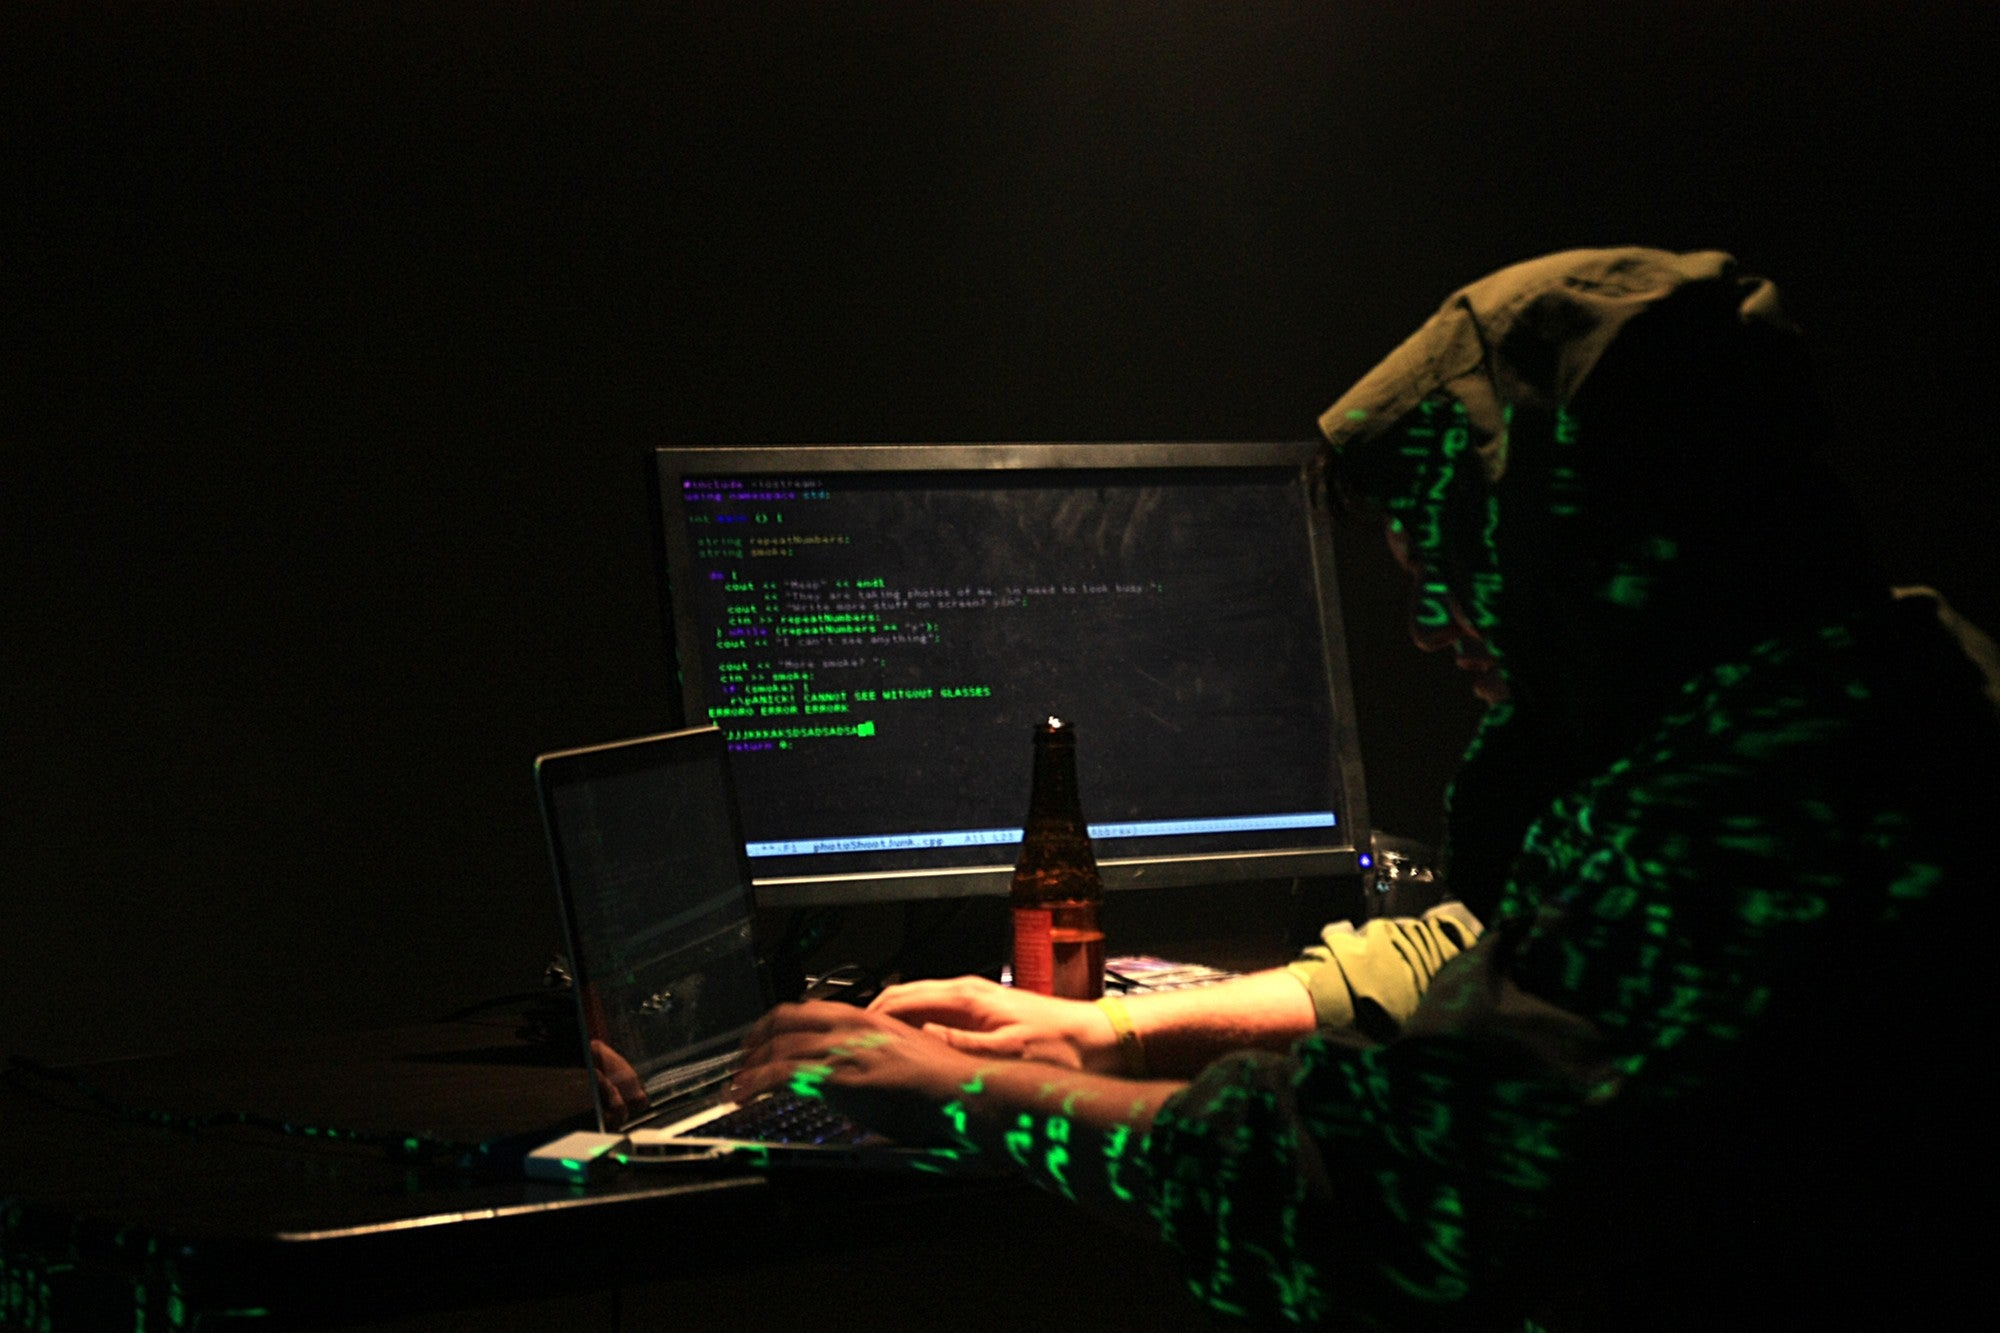 Think Tank Report Warns Of Cyberterrorism In Space